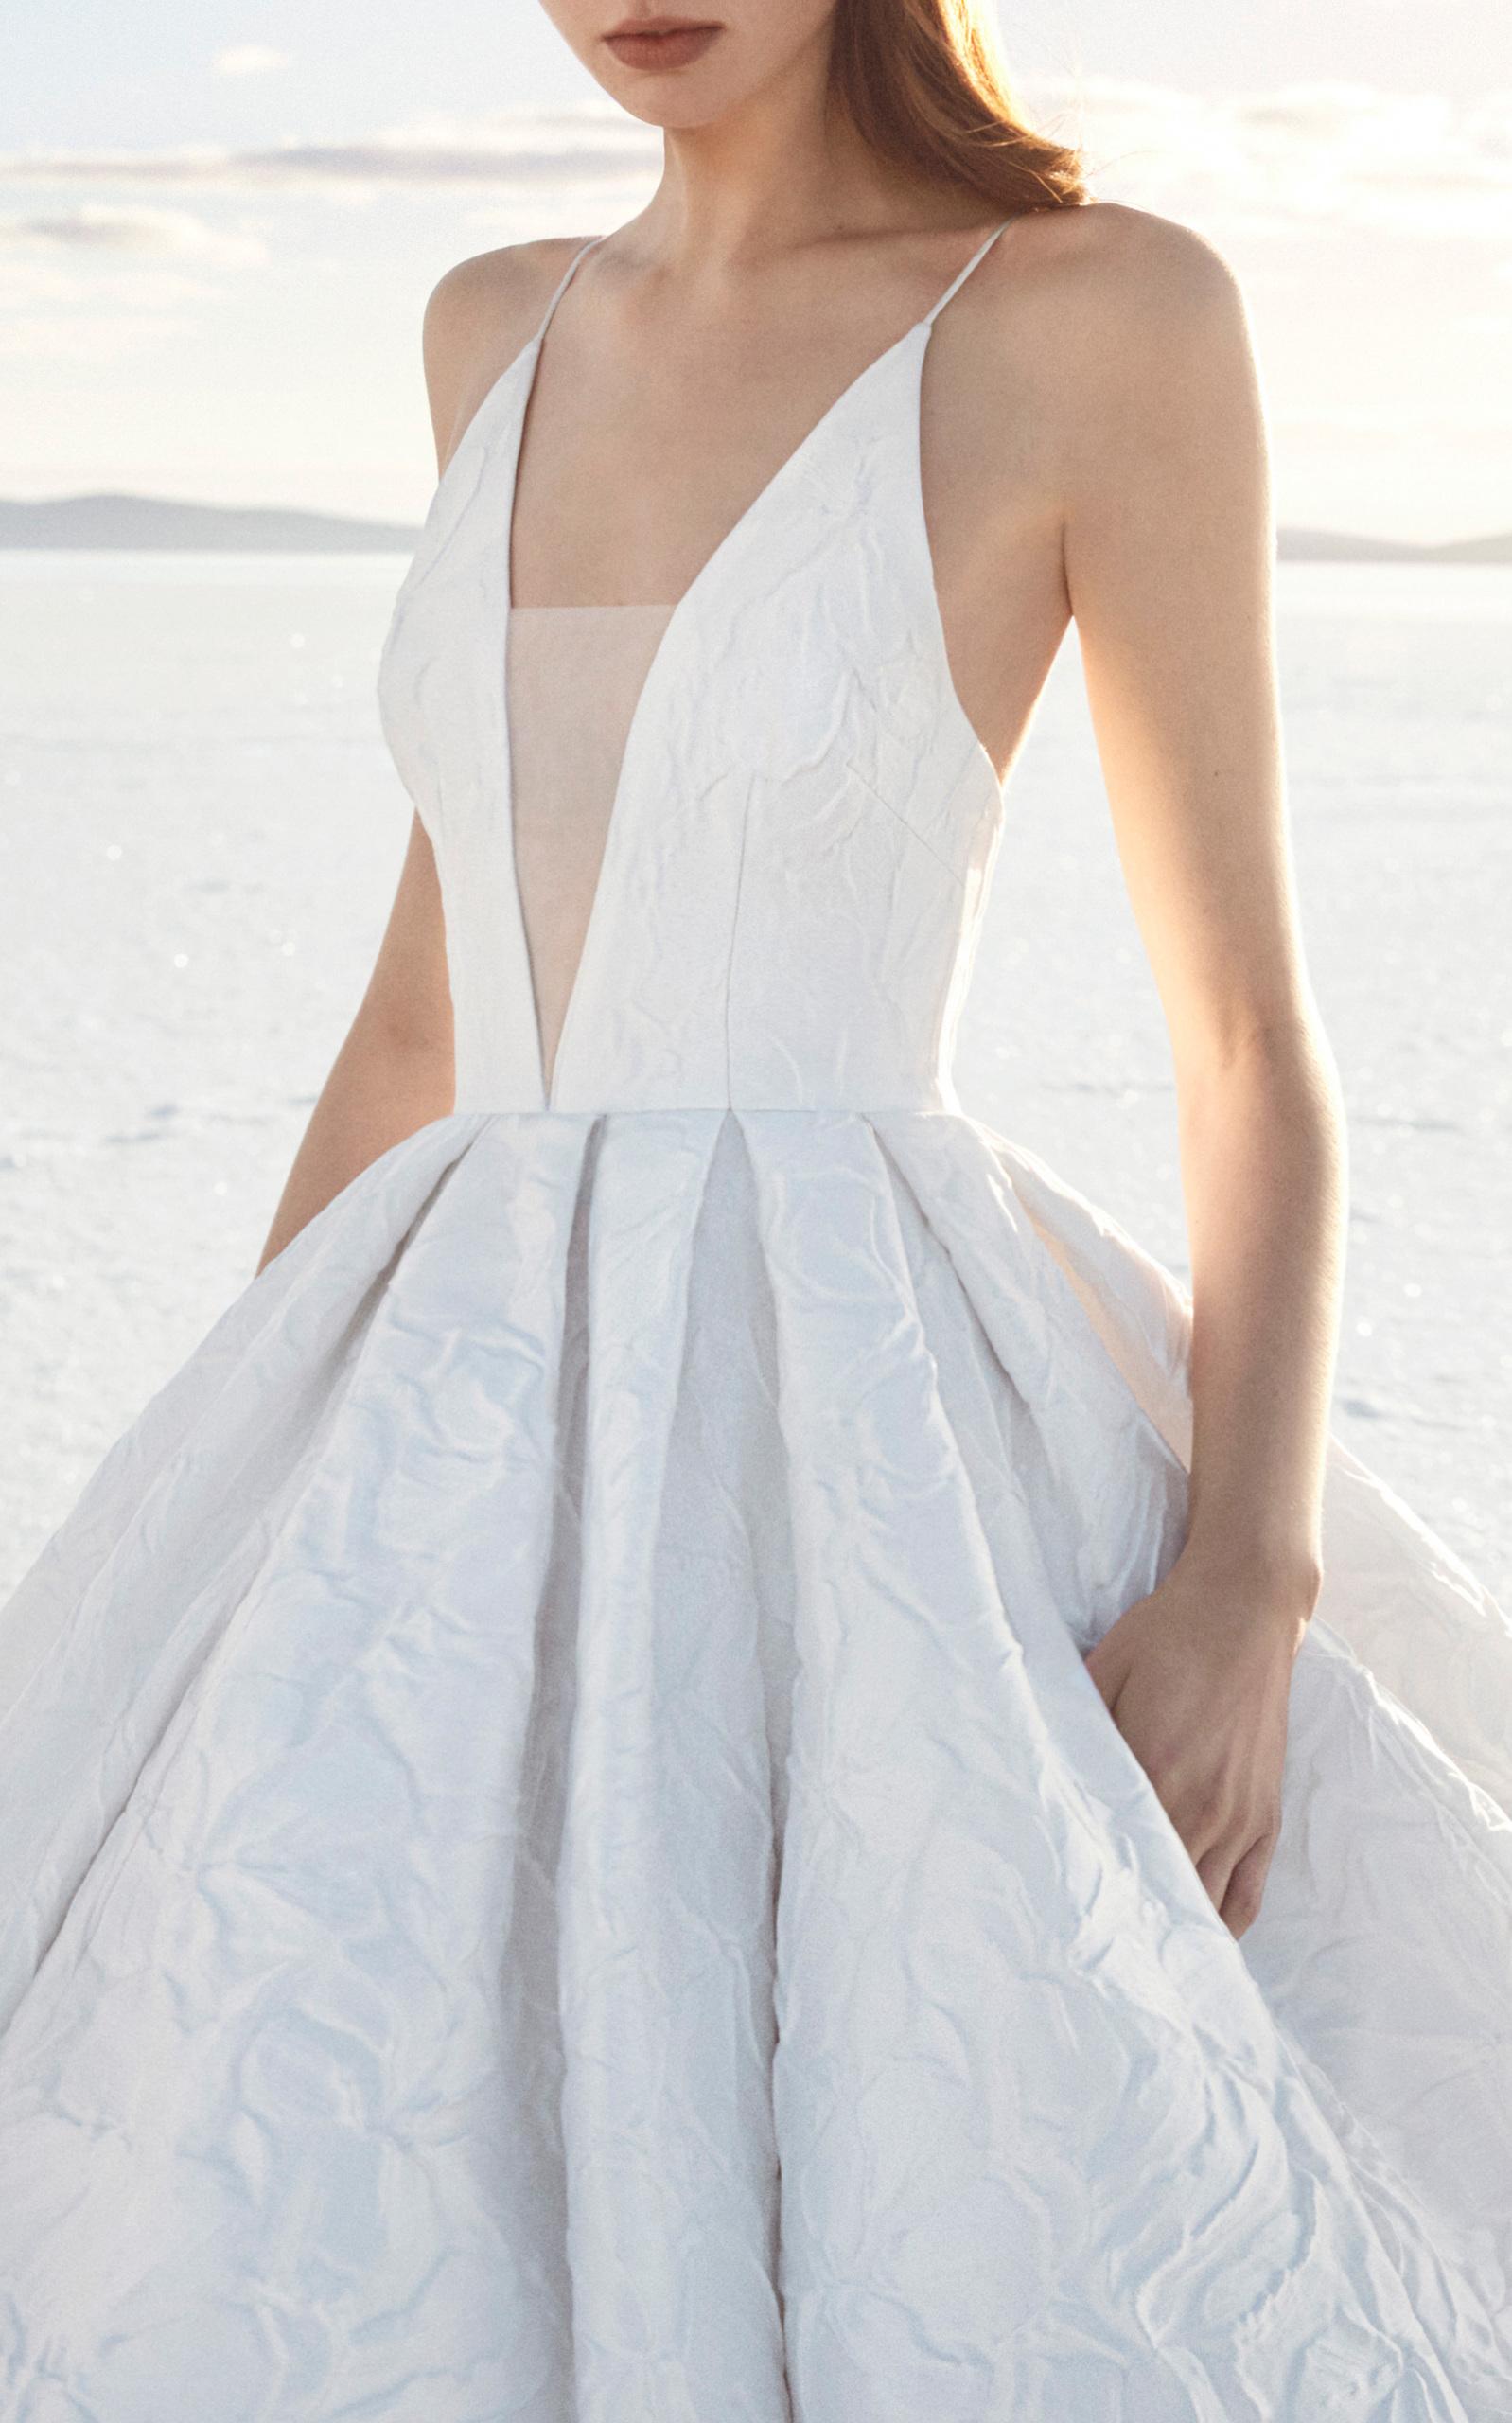 alex perry wedding dress 2018 spletnik2018 spletnik ru 8 2018. Black Bedroom Furniture Sets. Home Design Ideas